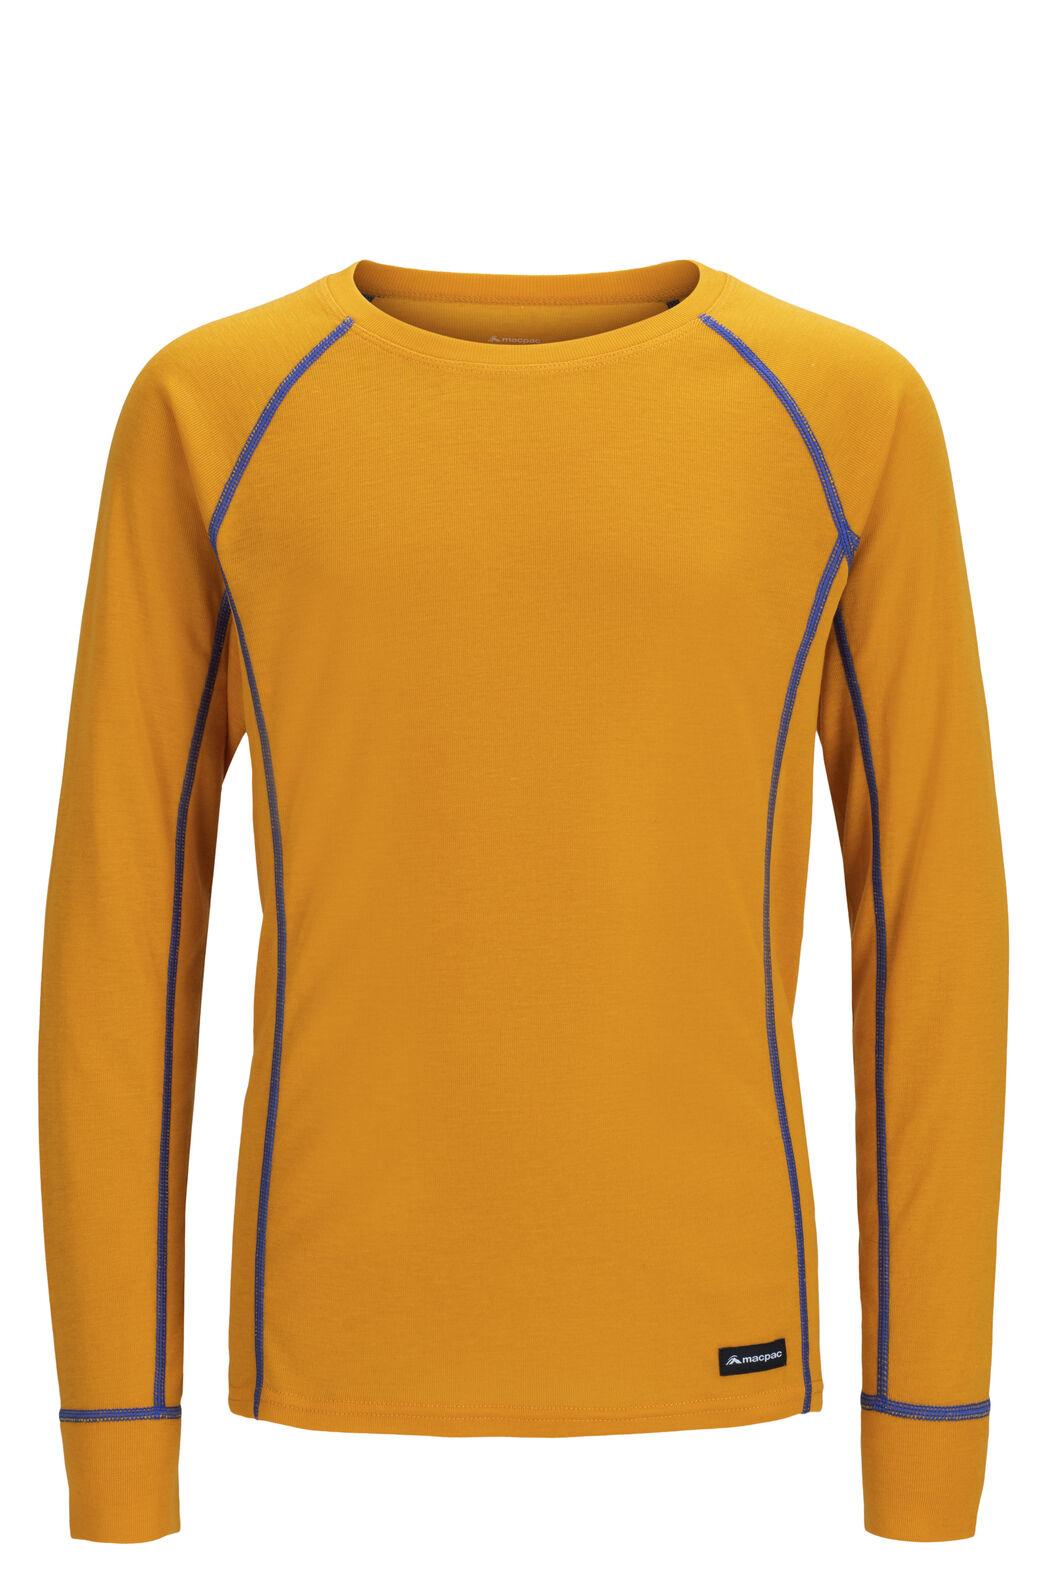 Macpac Geothermal Long Sleeve Top — Kids', Cadmium Yellow, hi-res